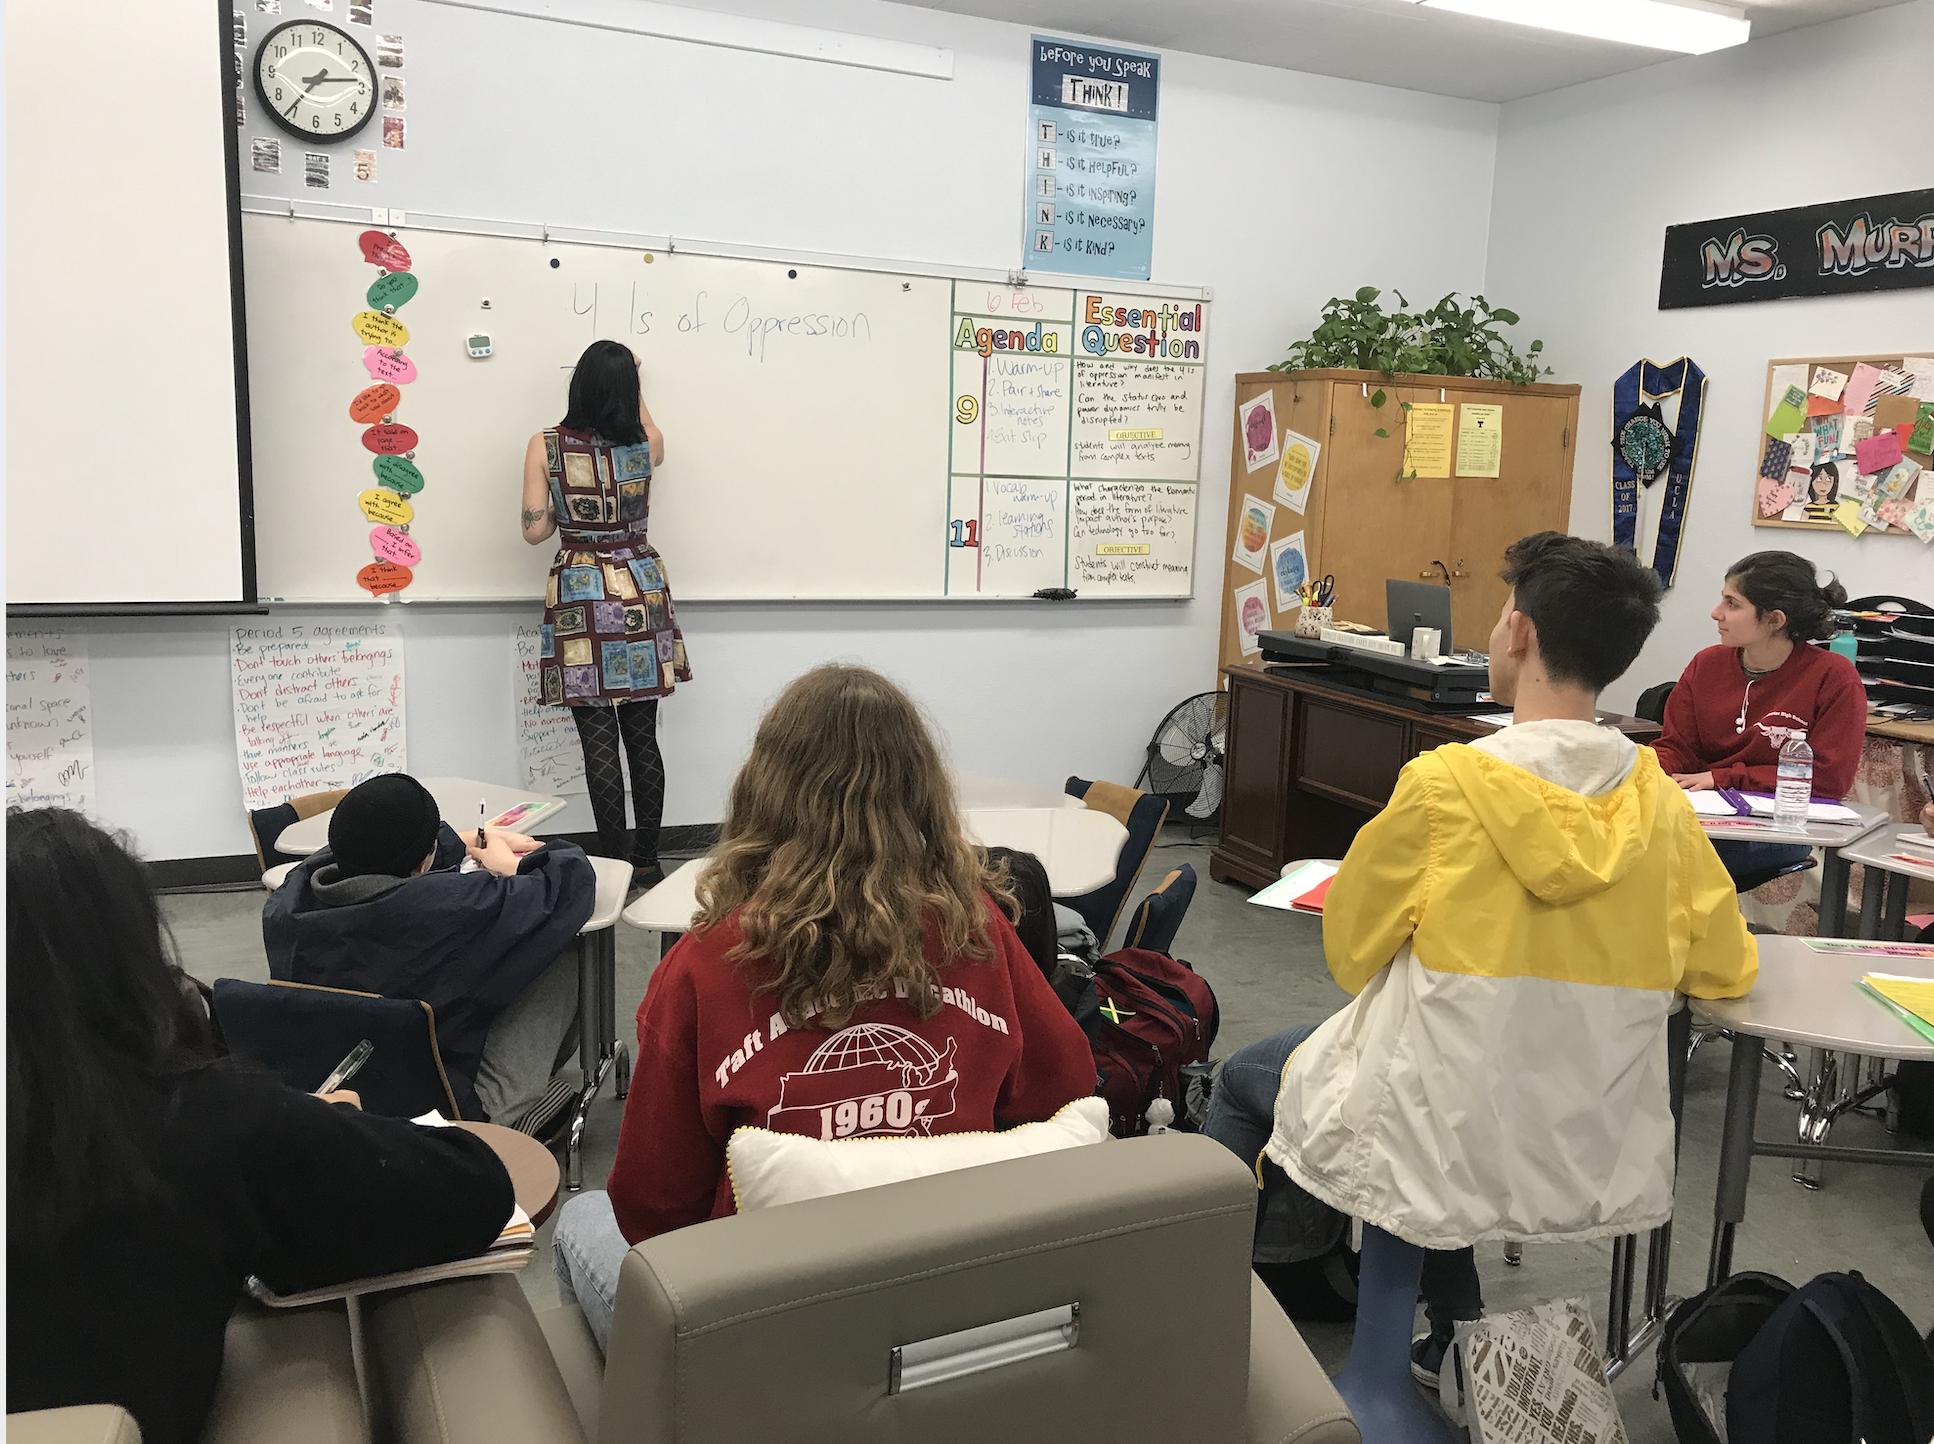 High school ELA teacher Angelina Murphy teaches a lesson on oppression to her class.